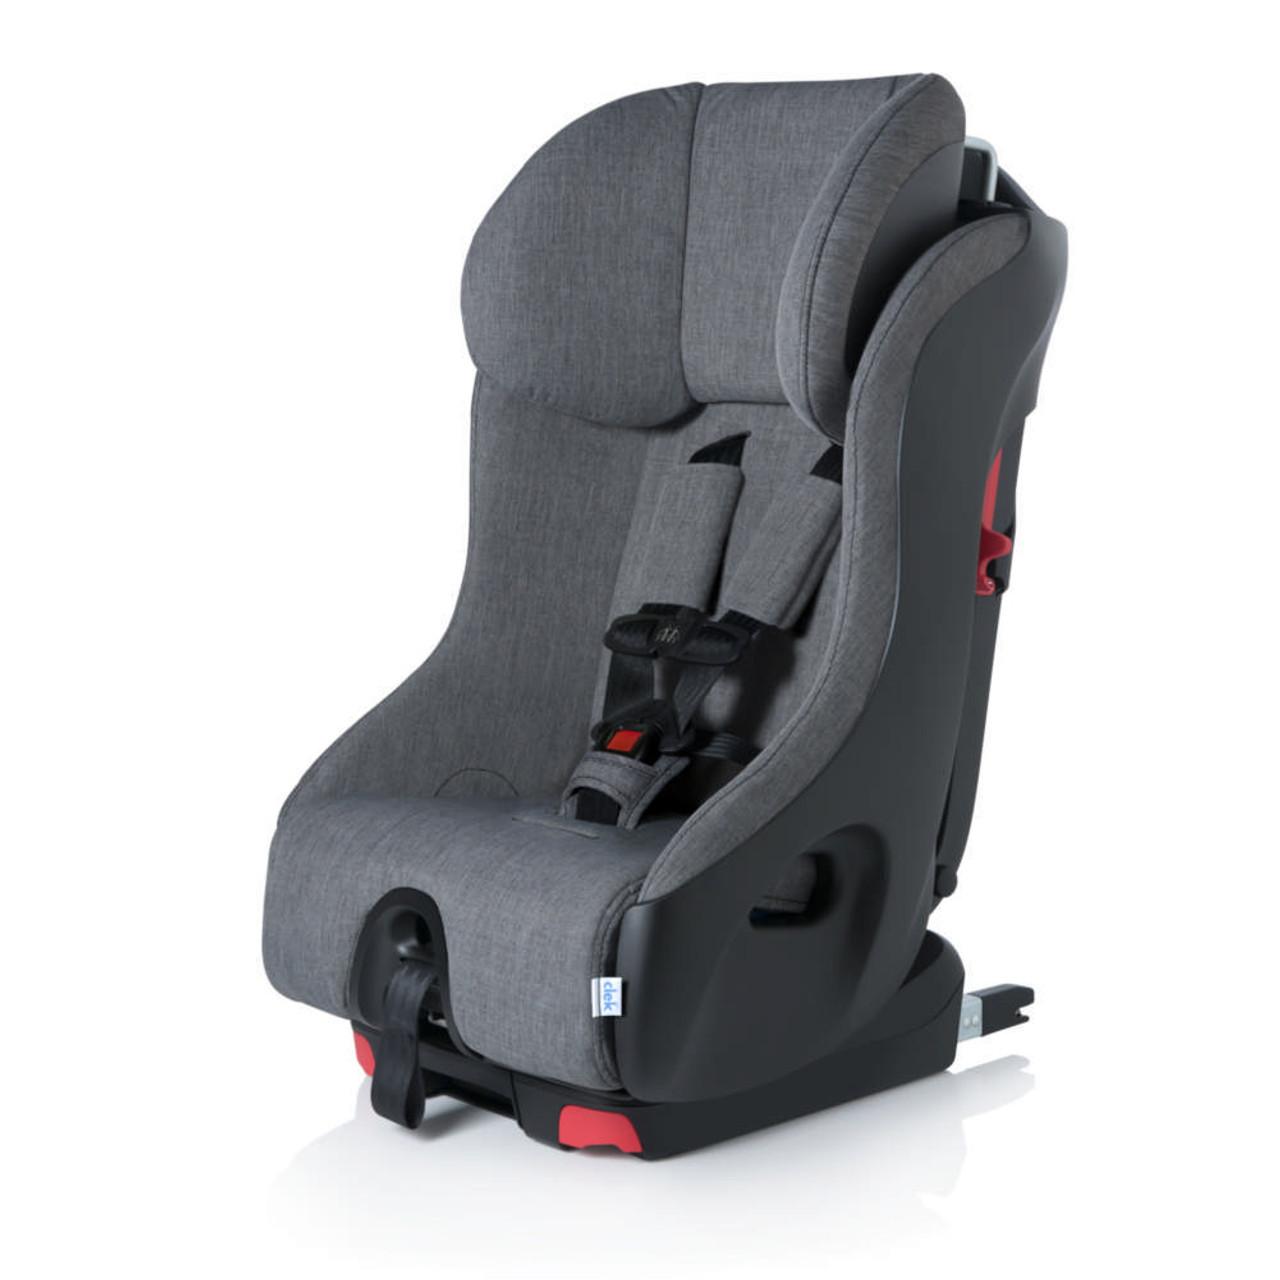 Clek Foonf 2018 Convertible Car Seat